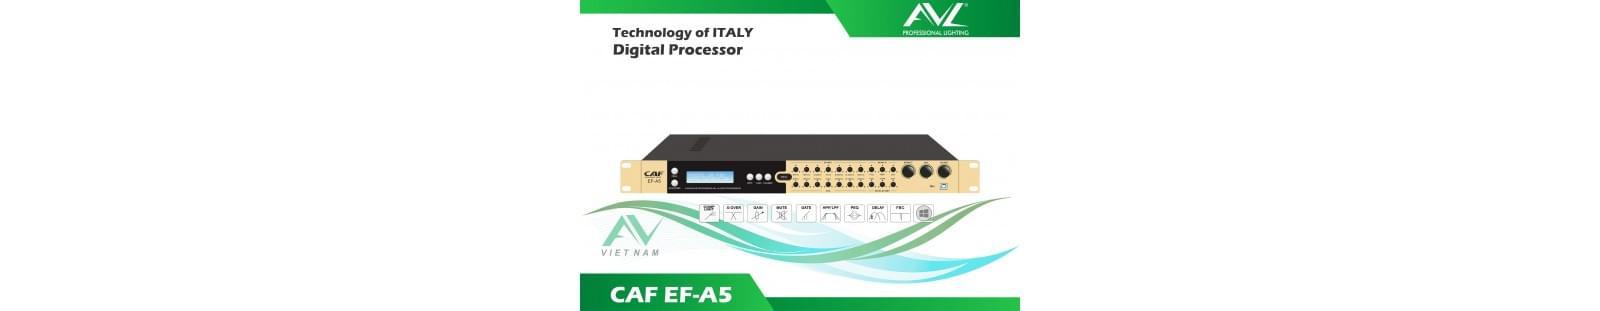 CAF EF-A5